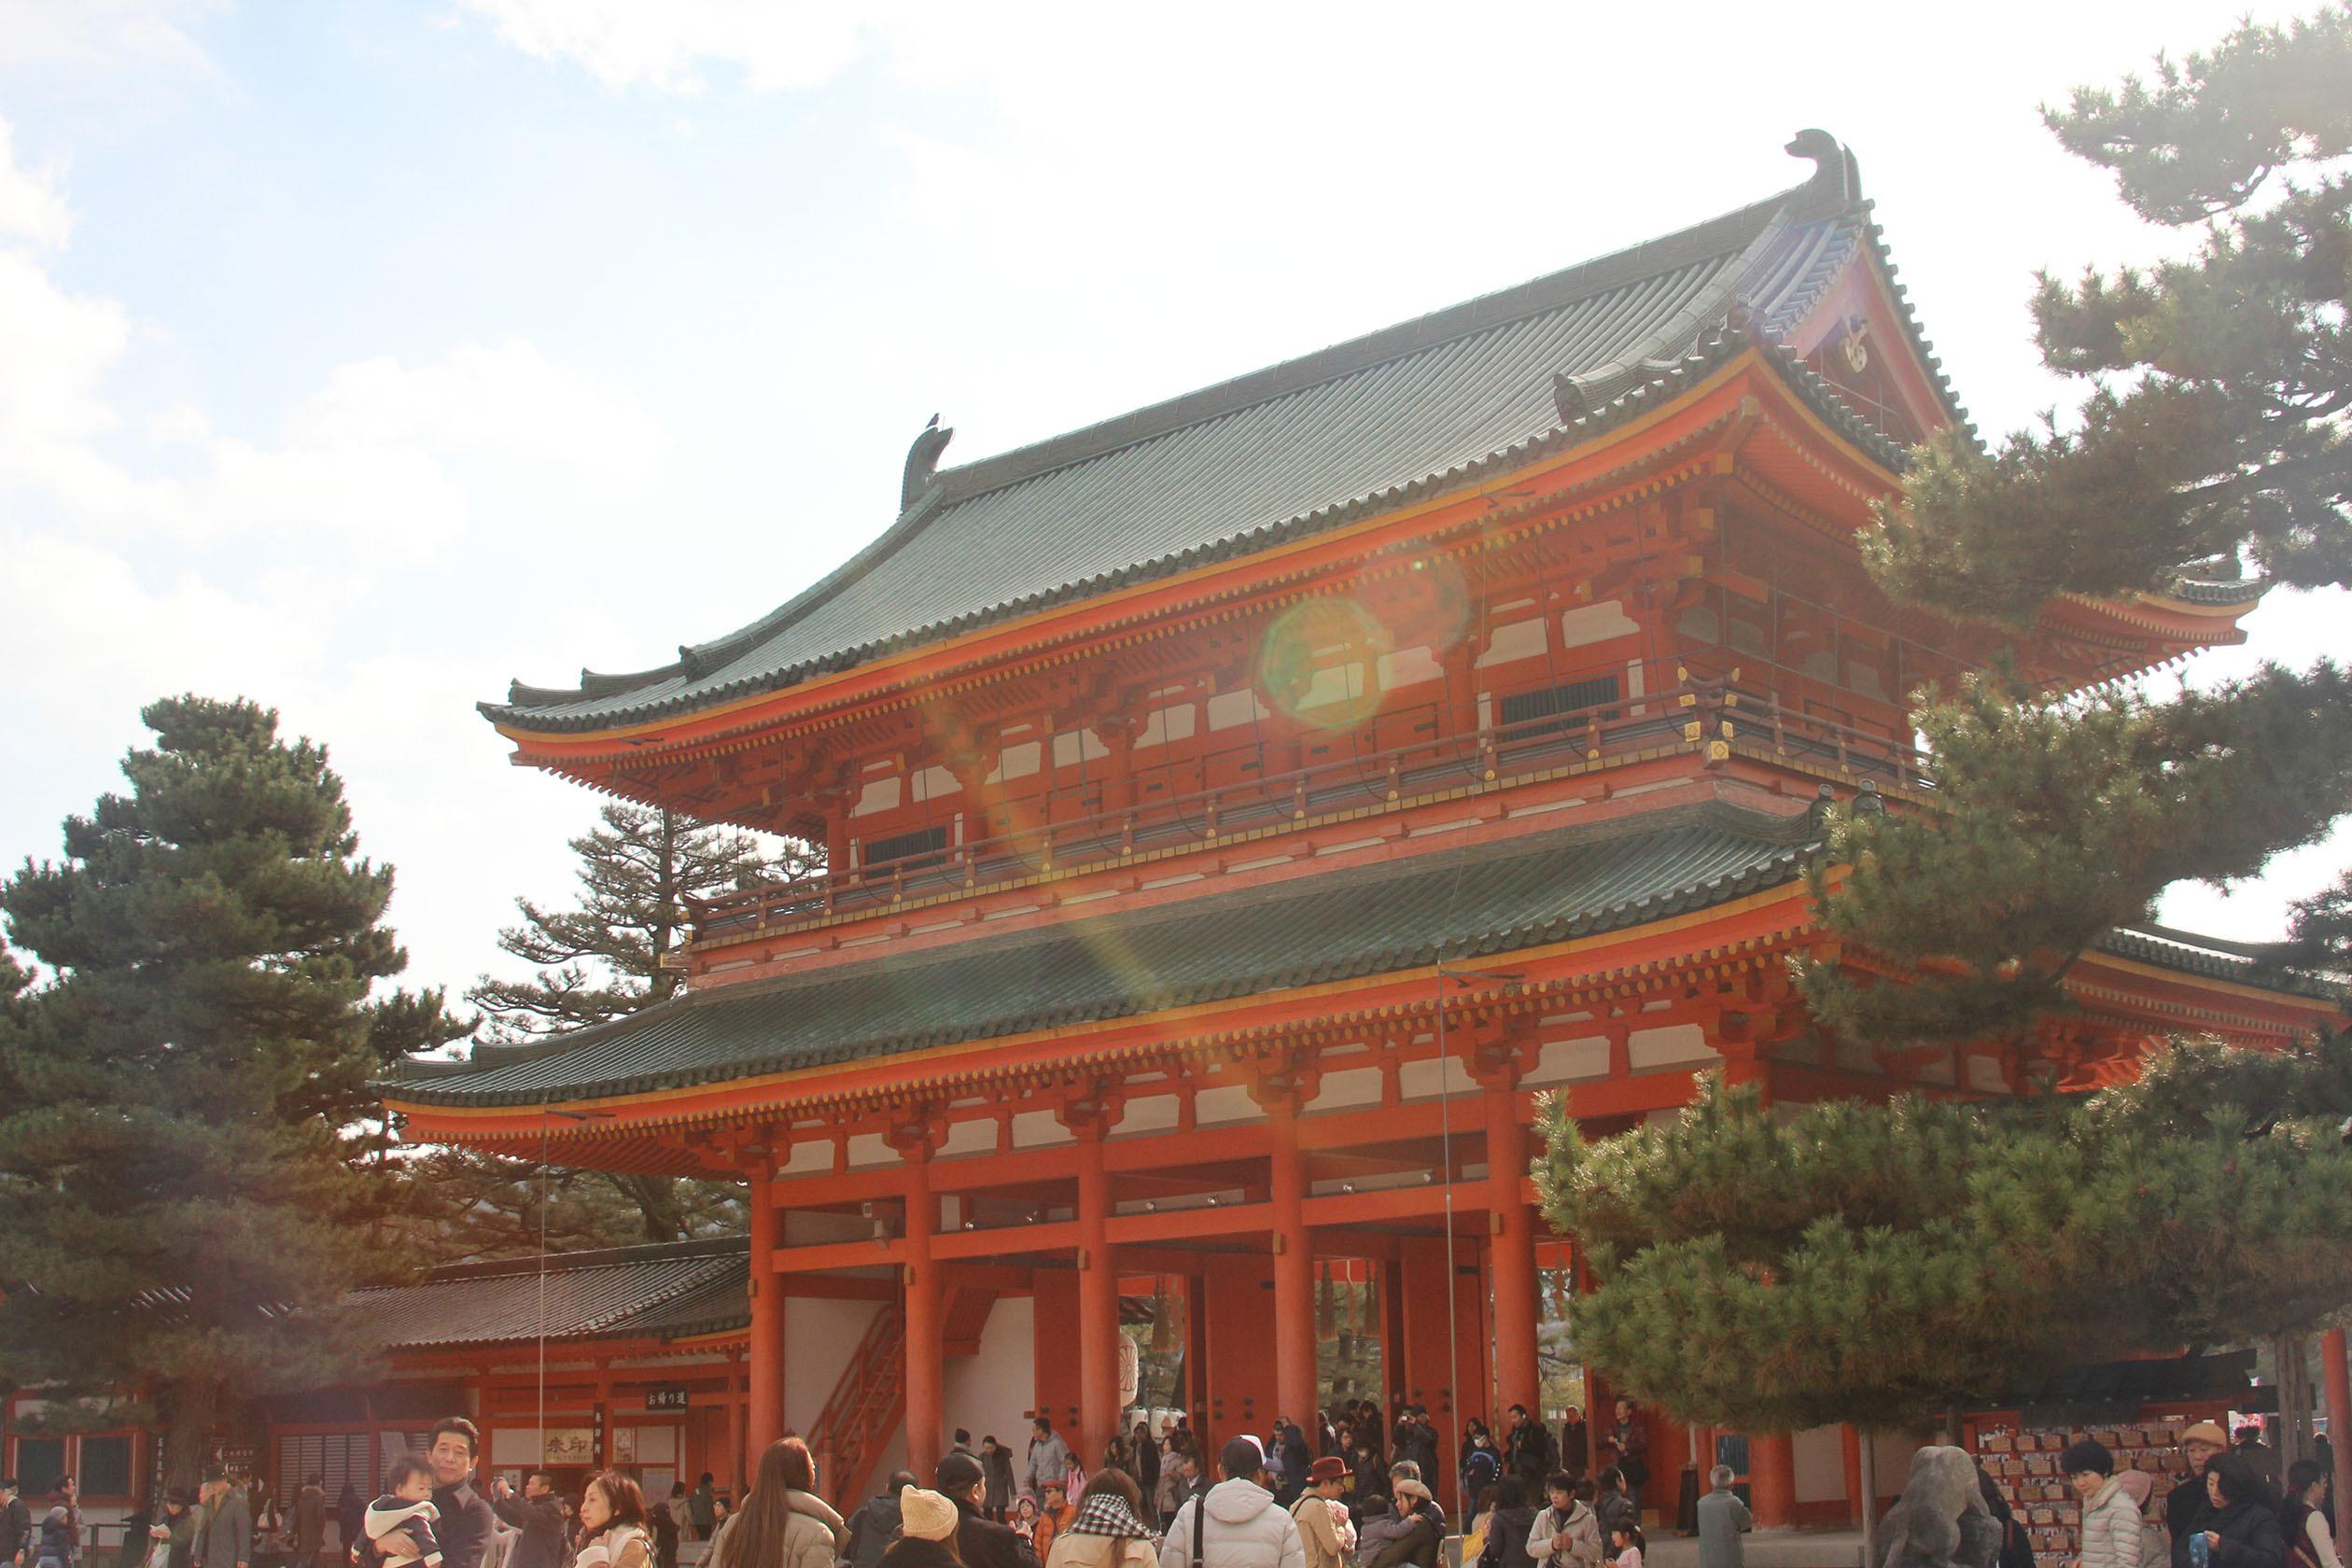 kyoto20170103004.jpg